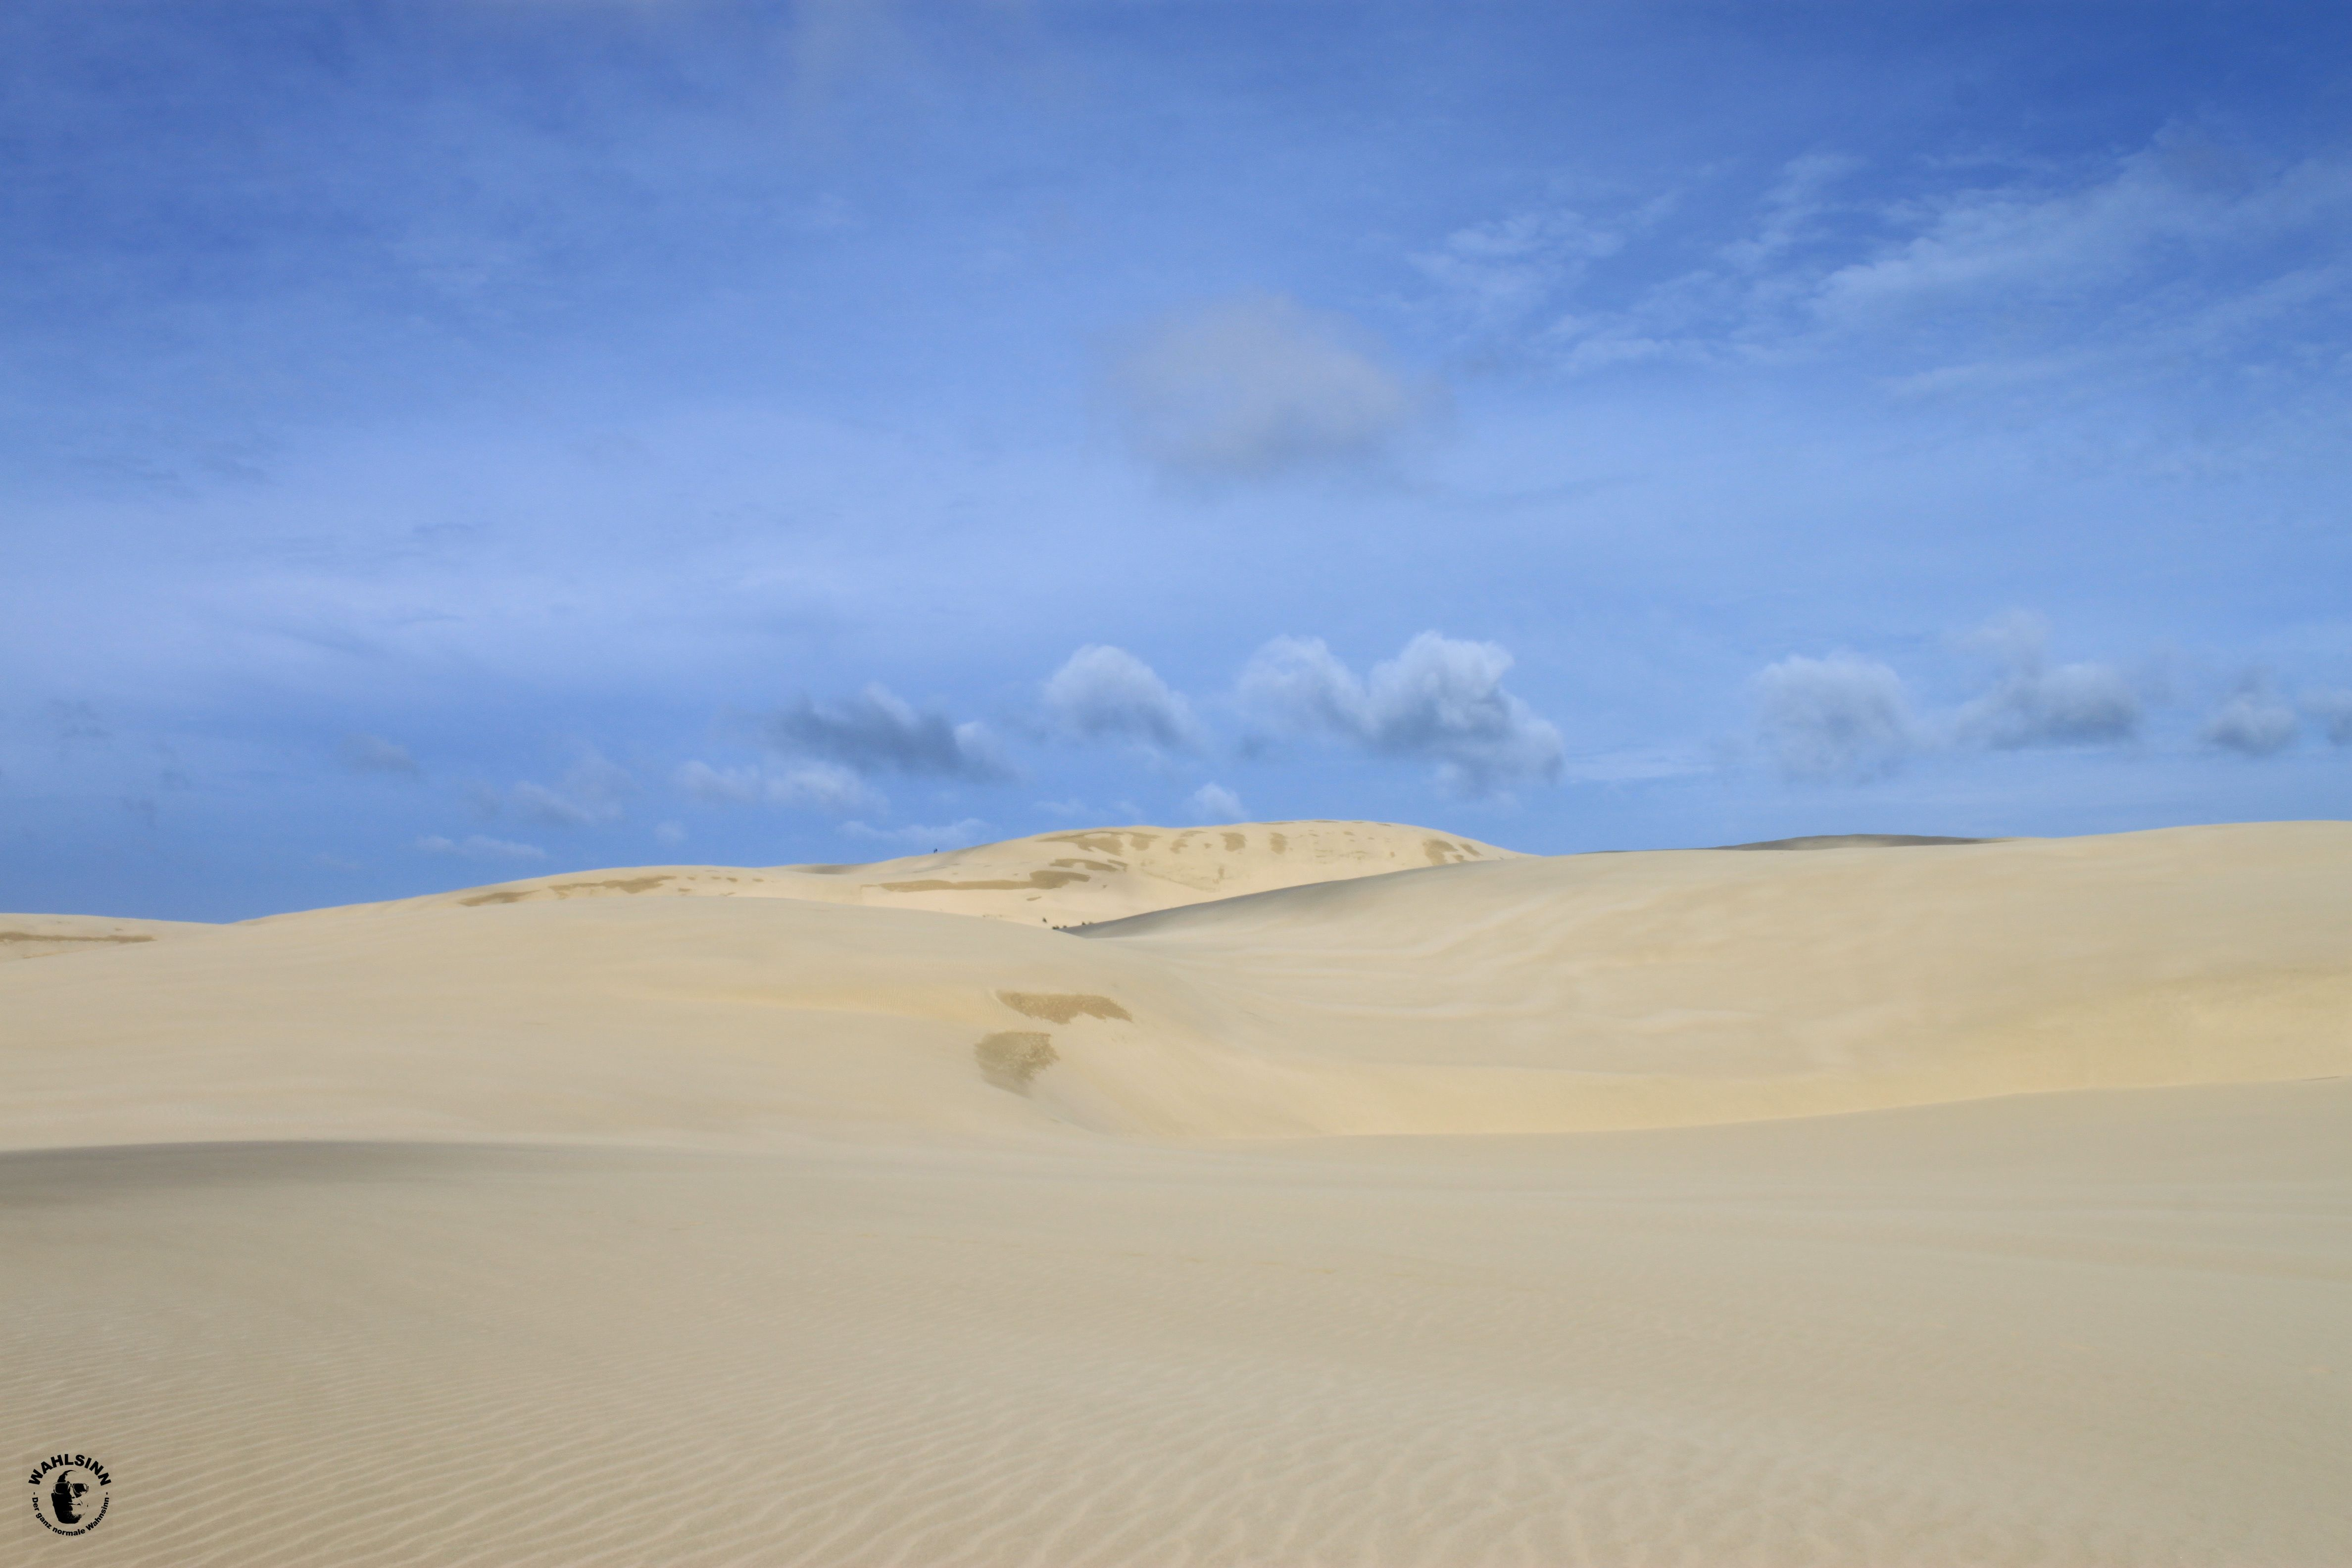 Sandboarden in Neuseeland